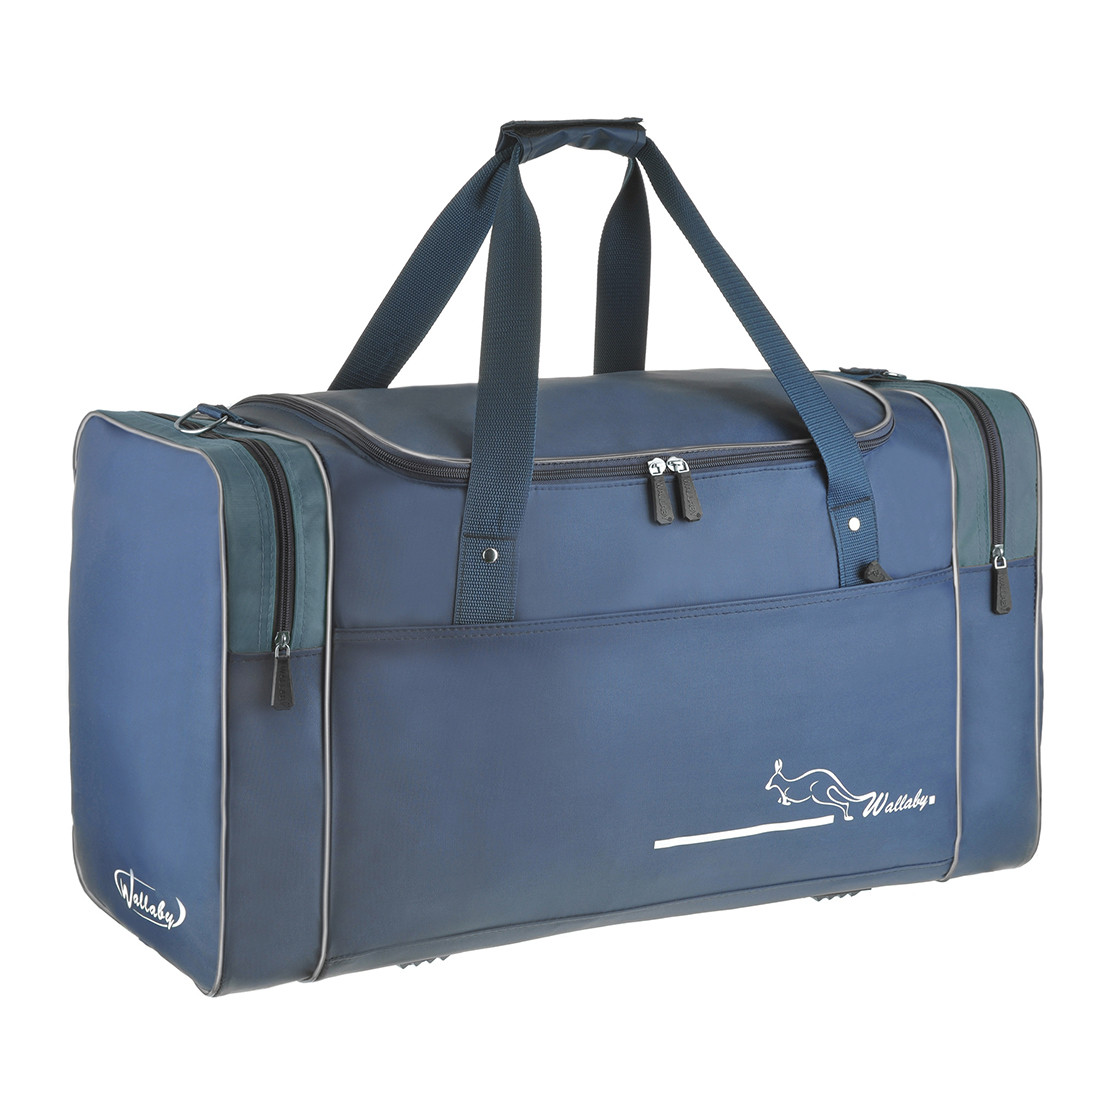 Большая дорожная сумка Wallaby  63х36х27 синий нейлон 420Д  на ПВХ основе  в 430син